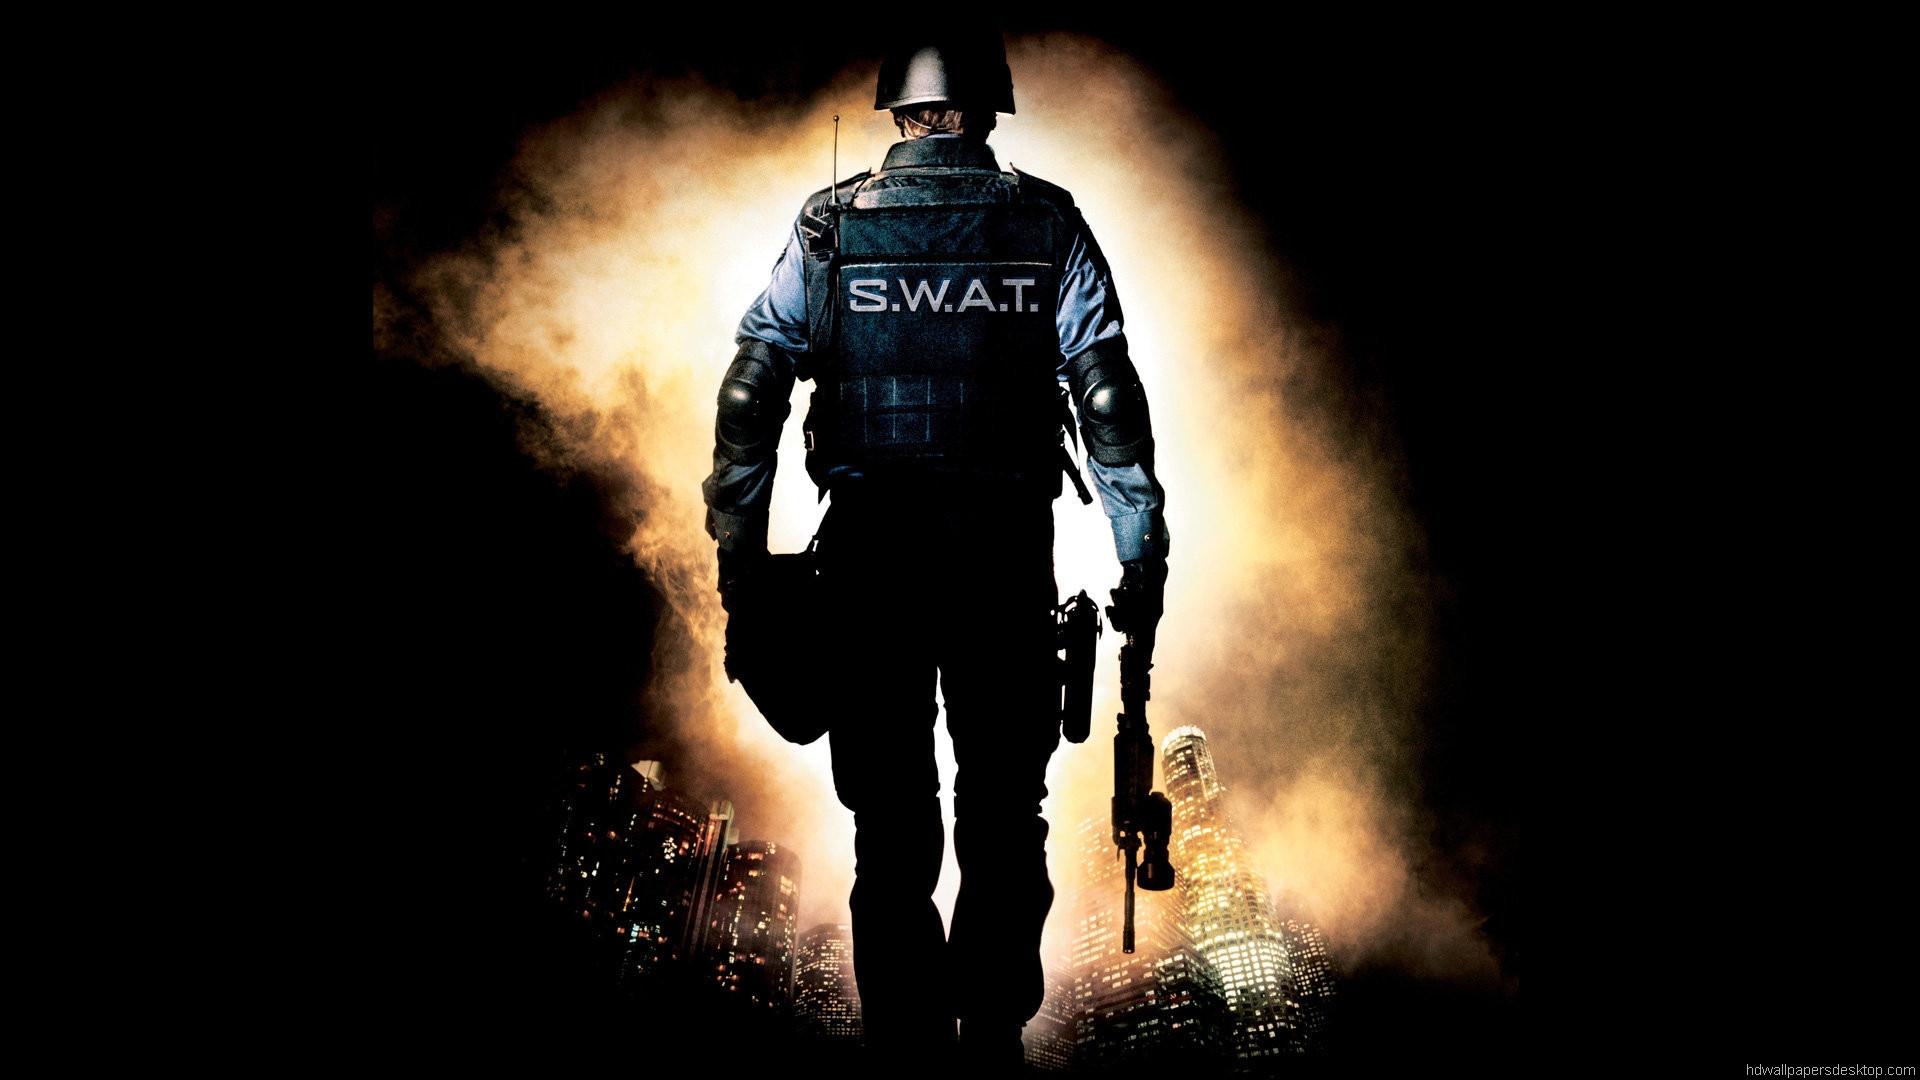 swat hd wallpaperSWATWallpaperHDDesktopWallpapersTeam Wallpaper 1920x1080